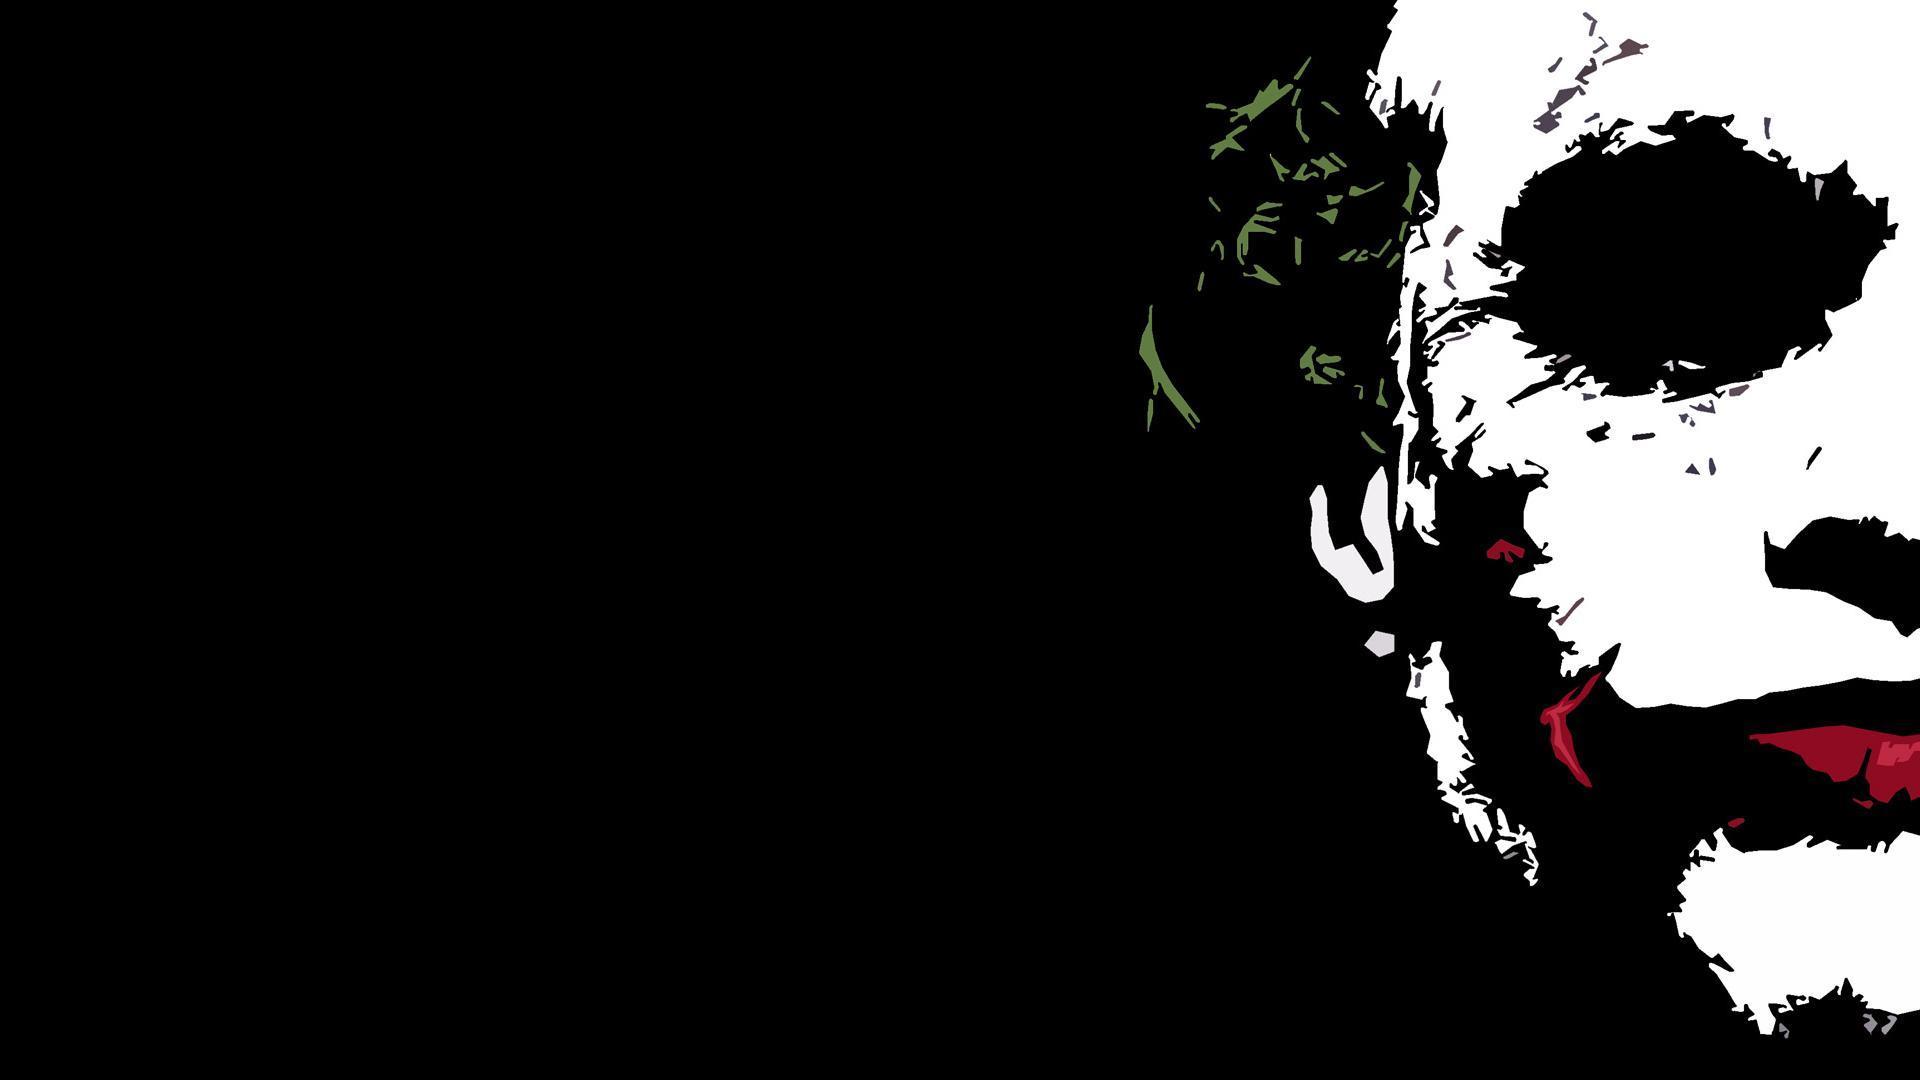 Joker Backgrounds 1920x1080